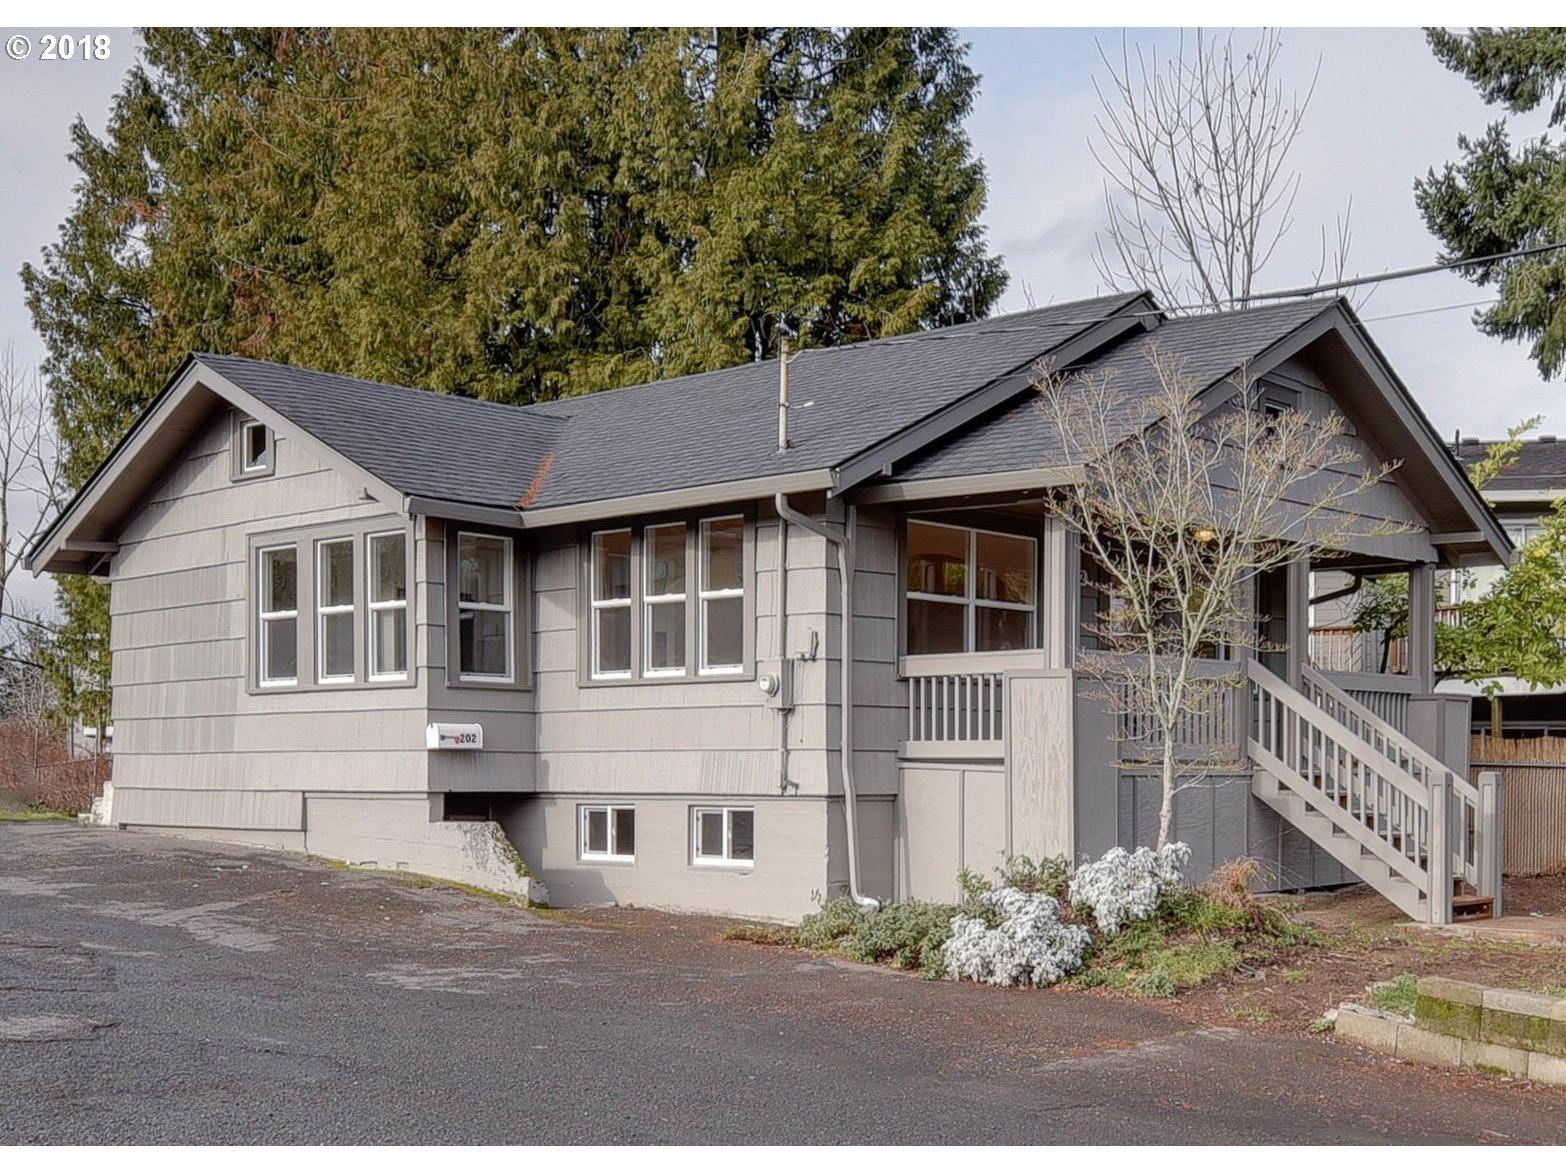 202 MOLALLA AVE OREGON CITY OR 97045 Oregon City Realtor